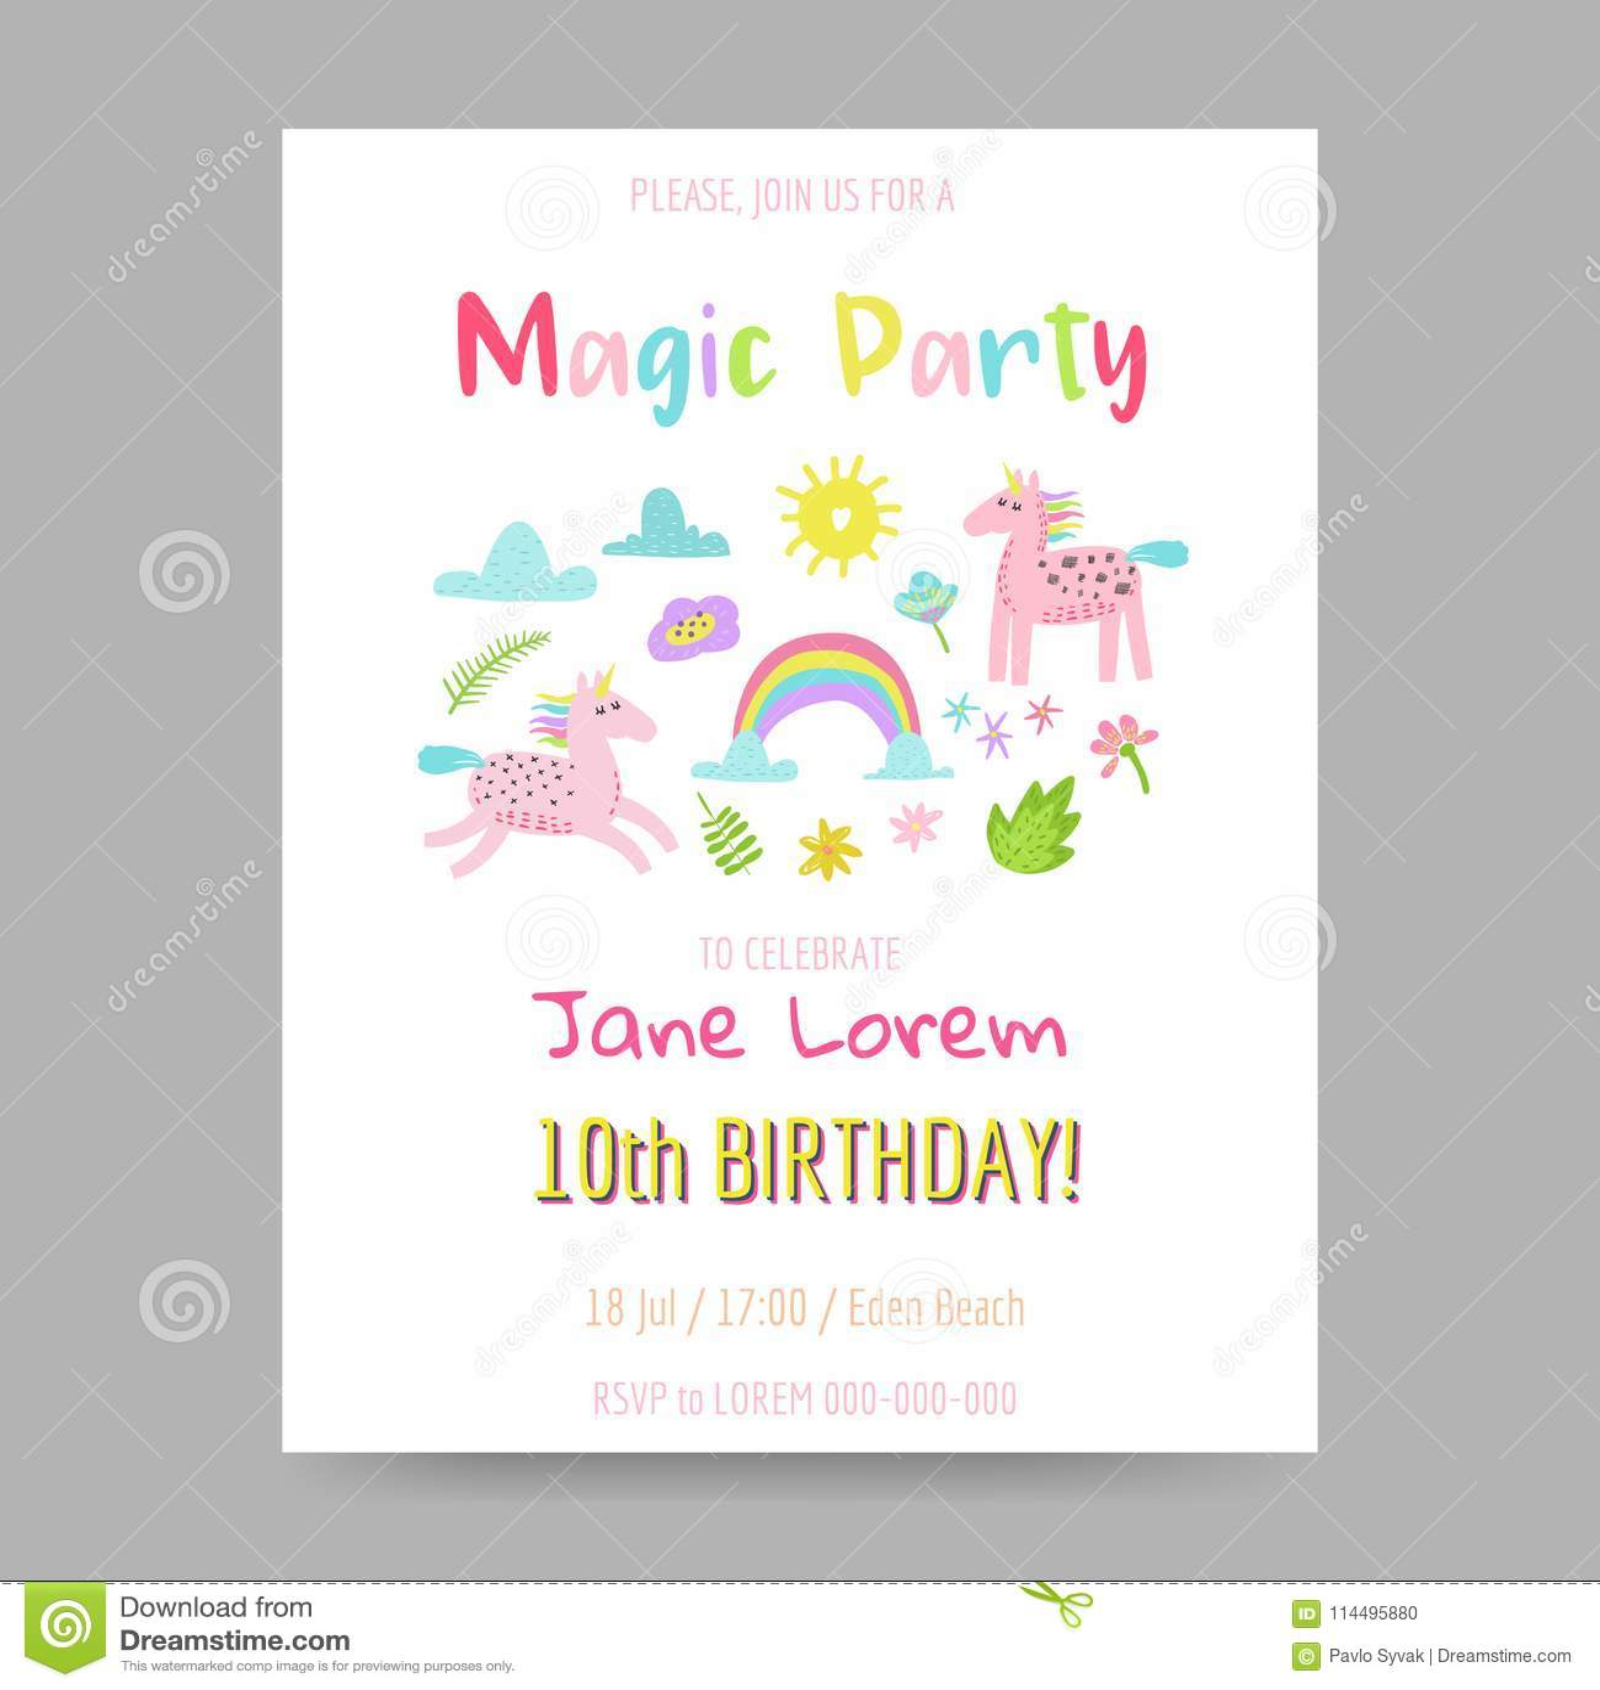 Greeting Card With Cute Magic Unicorns Rainbow And Flowers Fantasy Children Poster Happy Birthday Invitation Hand Drawn Childish Postcard